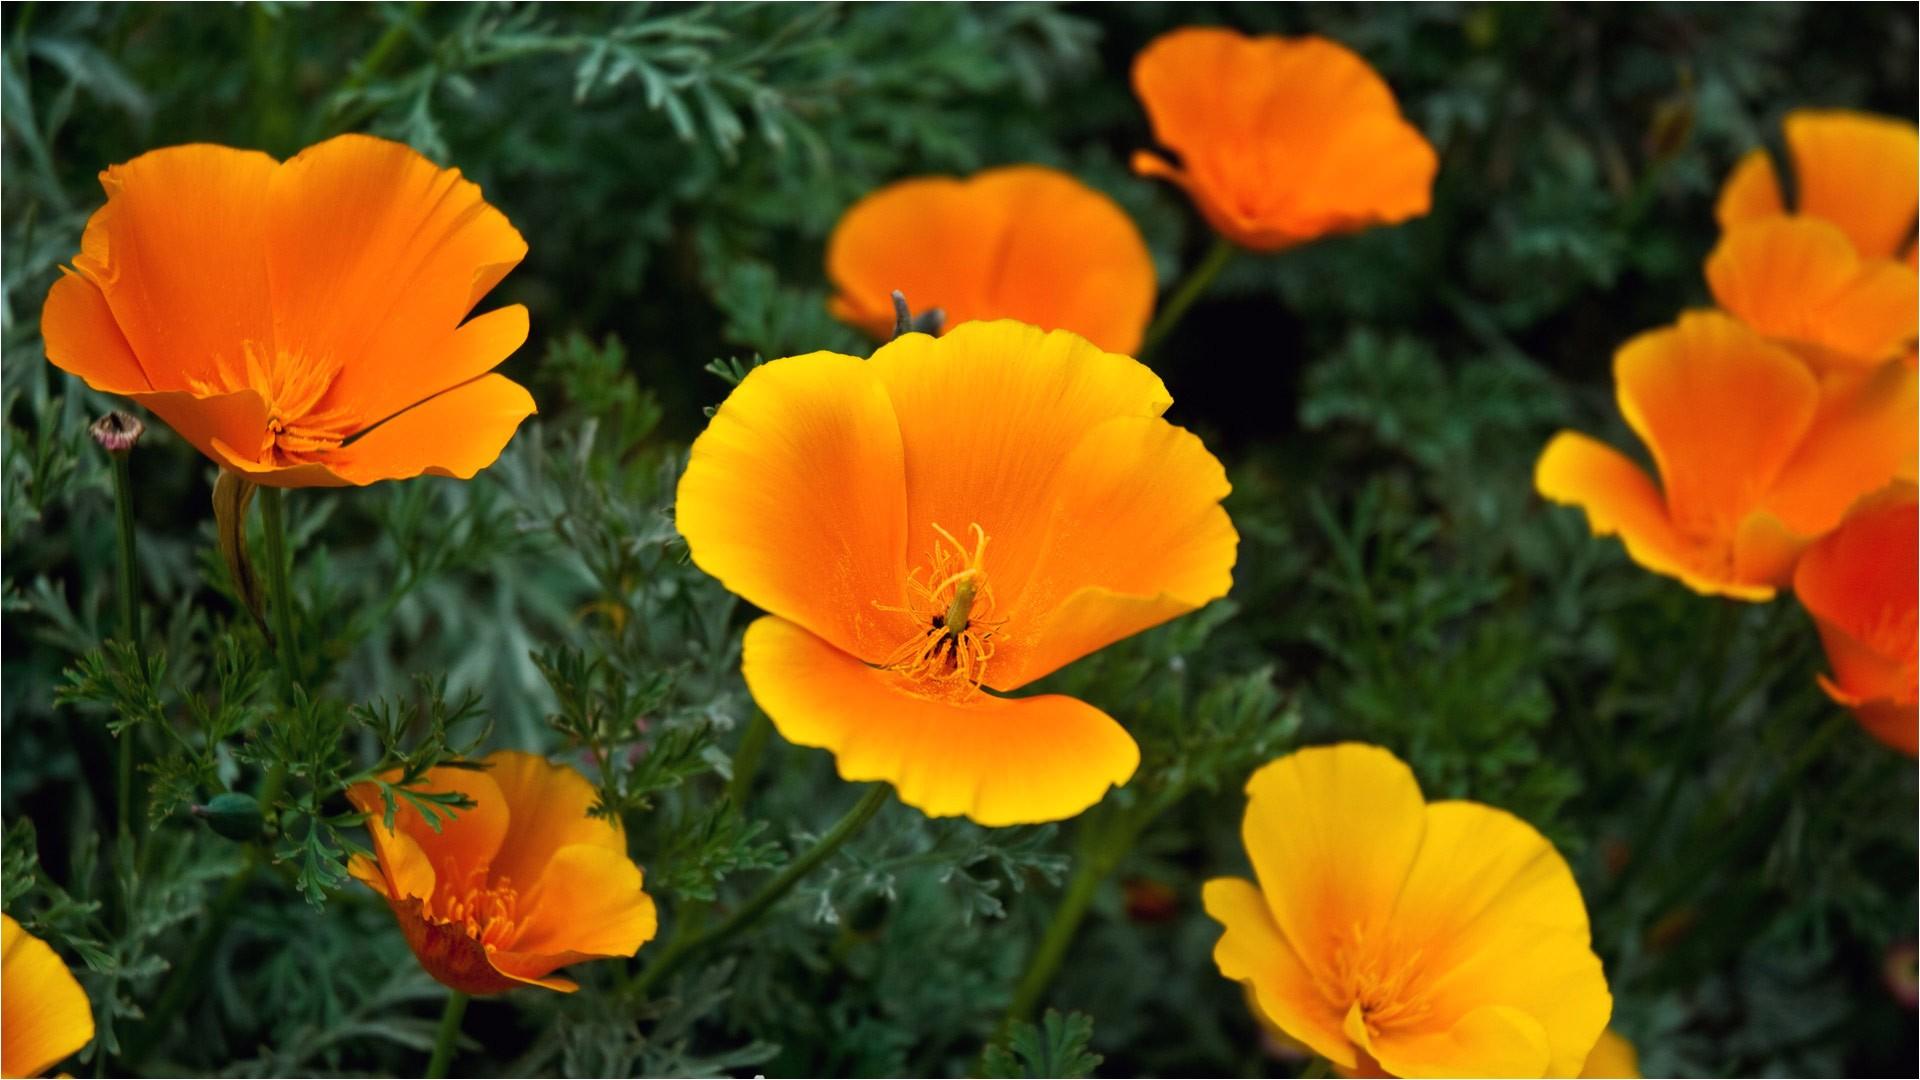 Orange Flowers Names and Pictures orange Flowers Names and Pictures